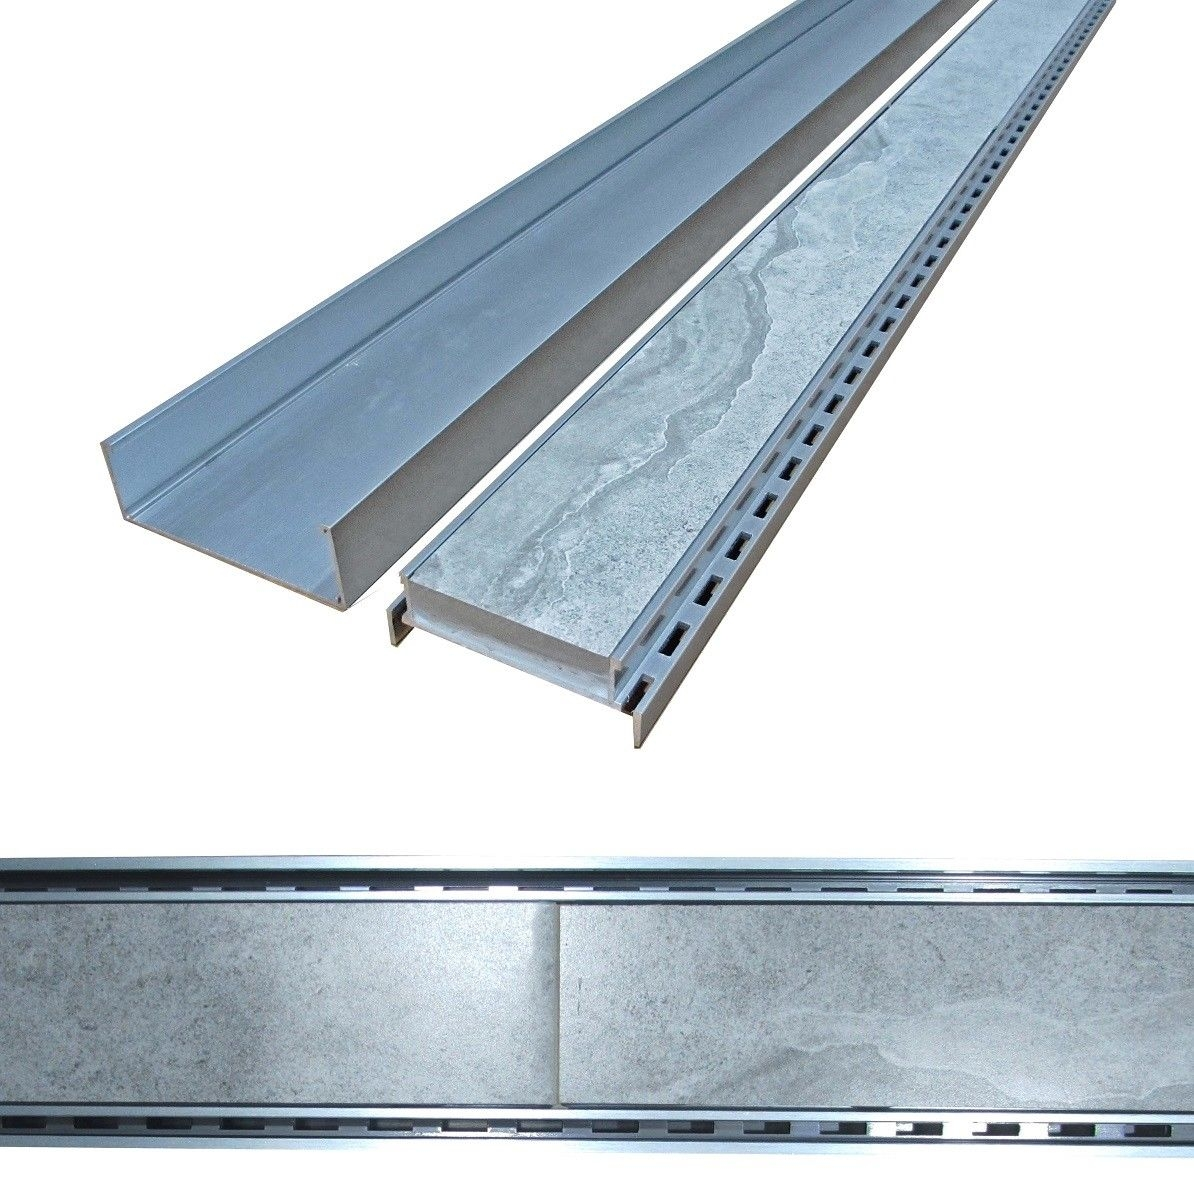 Lauxes Cellini 900mm Silver Slimline Floor Tile Insert